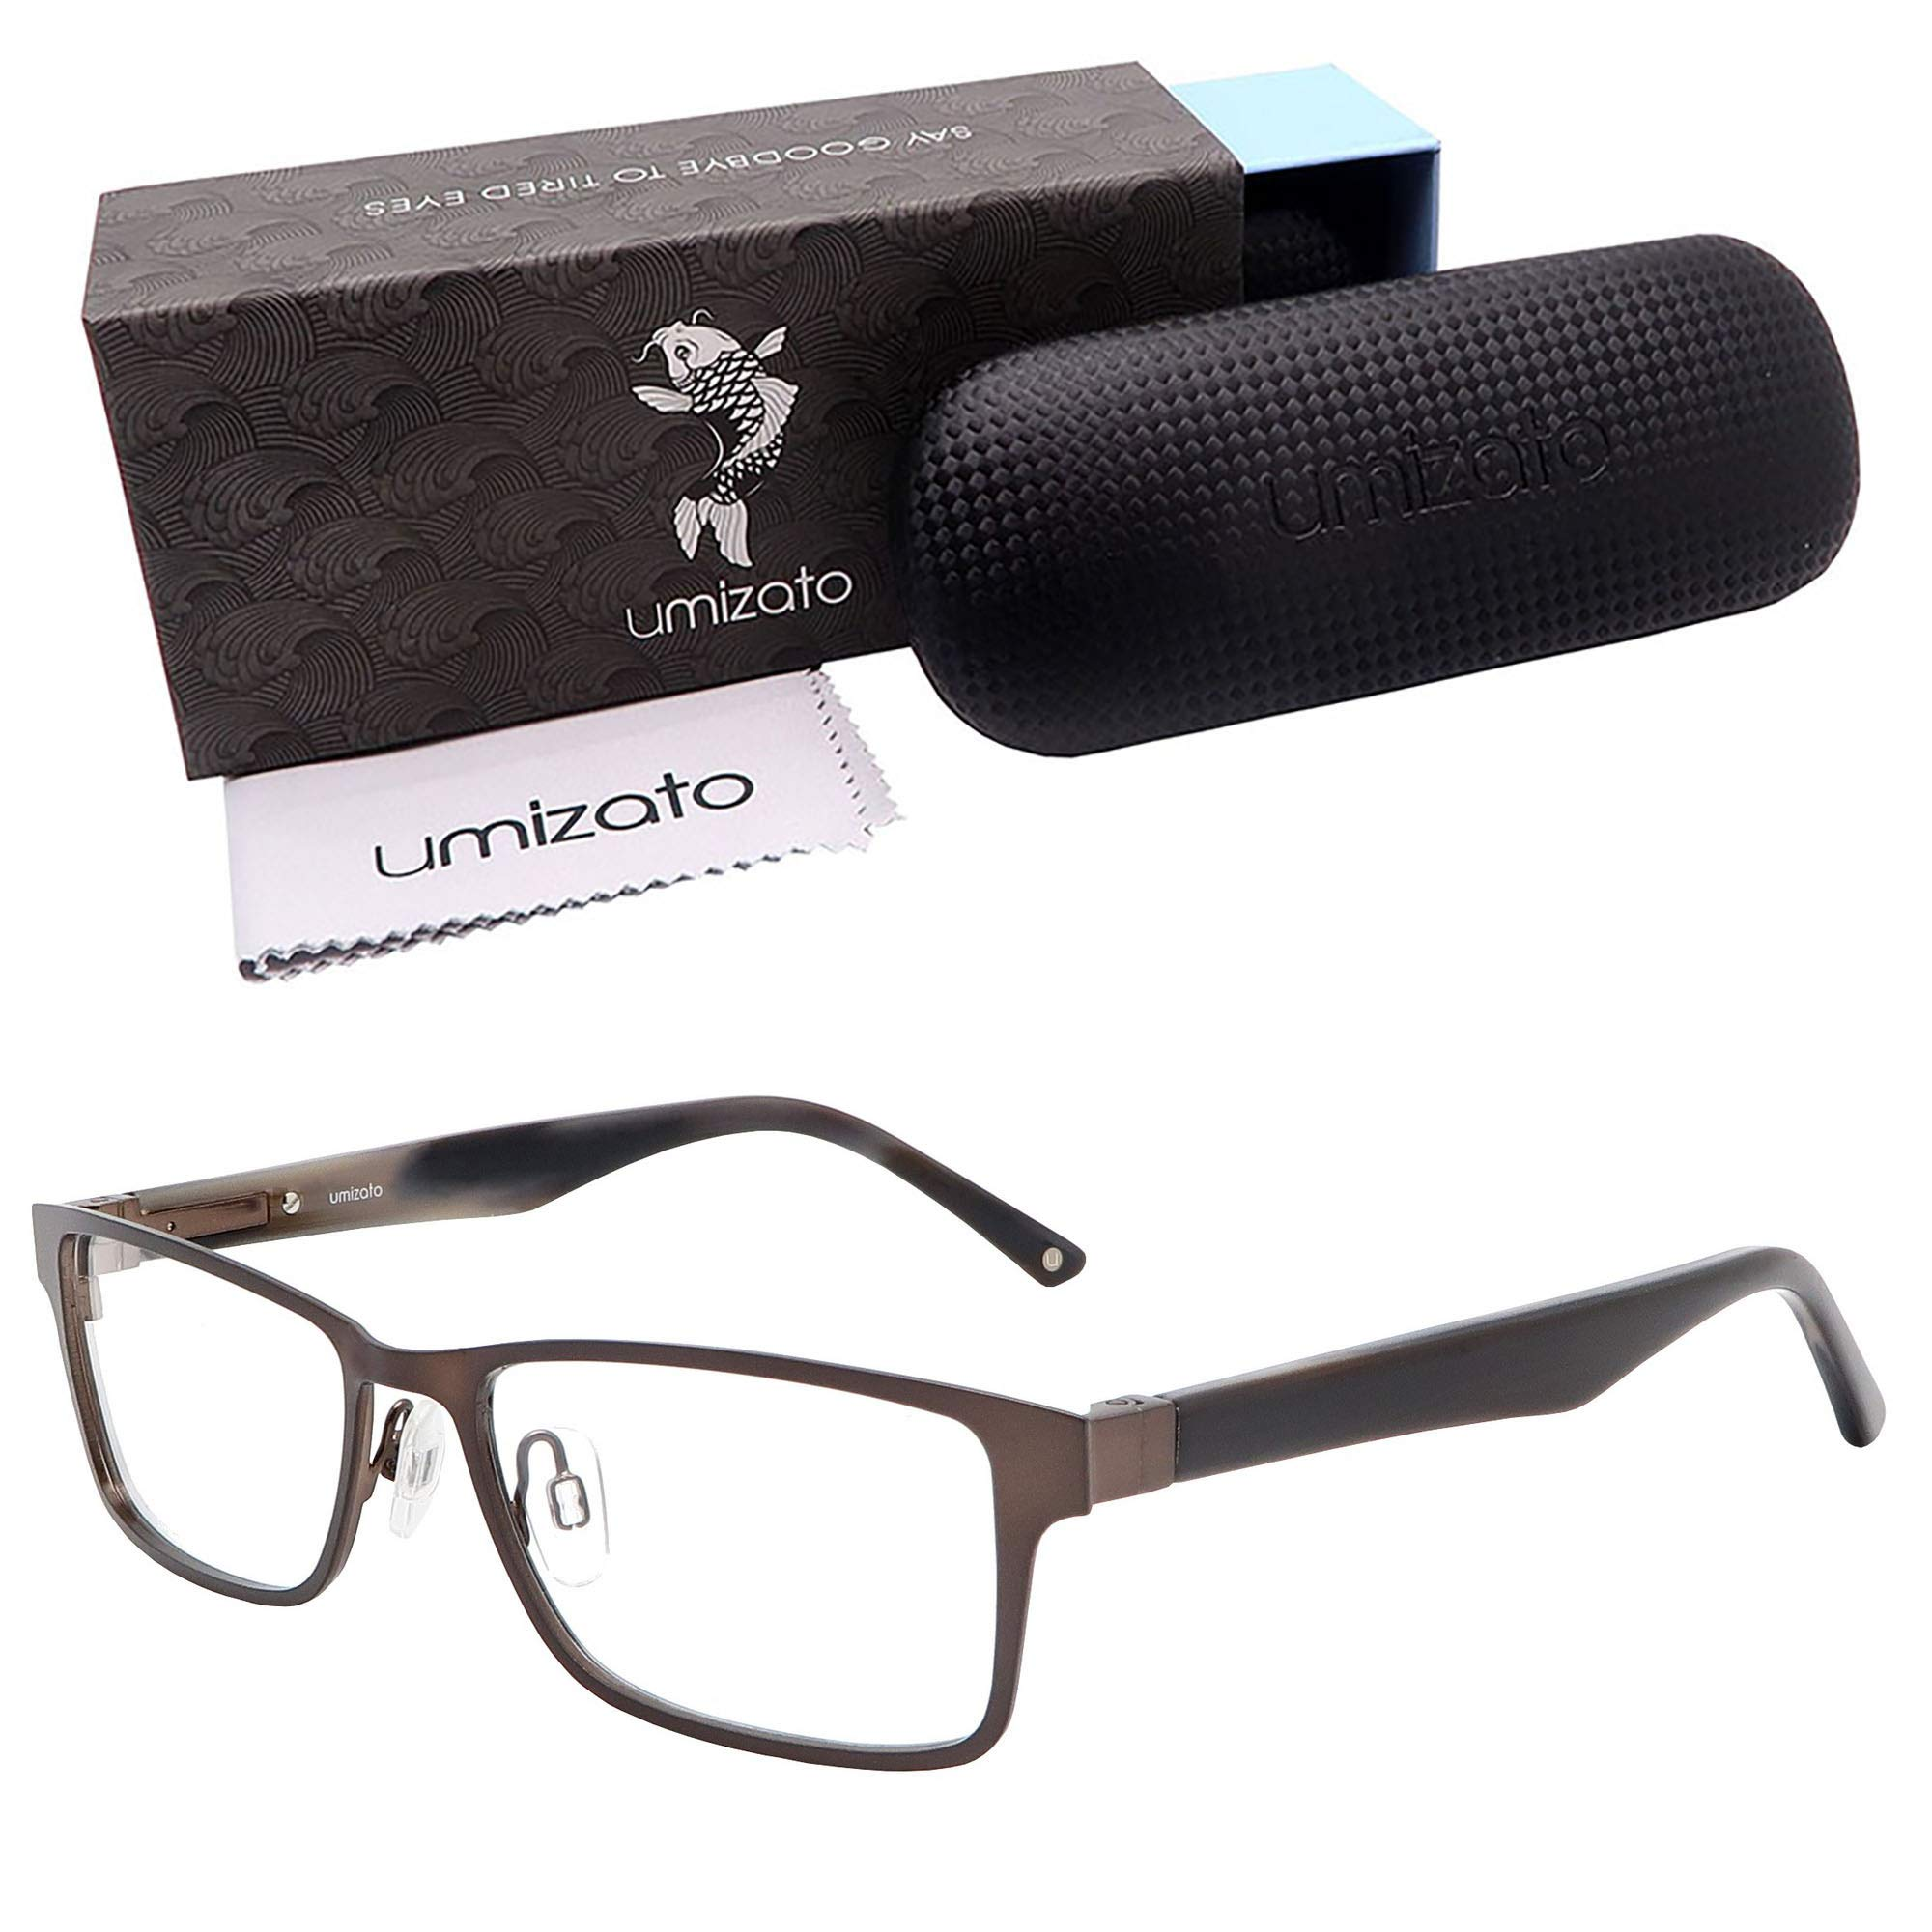 Umizato Blue Light Blocking Glasses for Men - Computer Screens Eye Protection - UV Anti-Glare Blocker, Relieves Strain, Sleep Better (Kobe in Walnut)